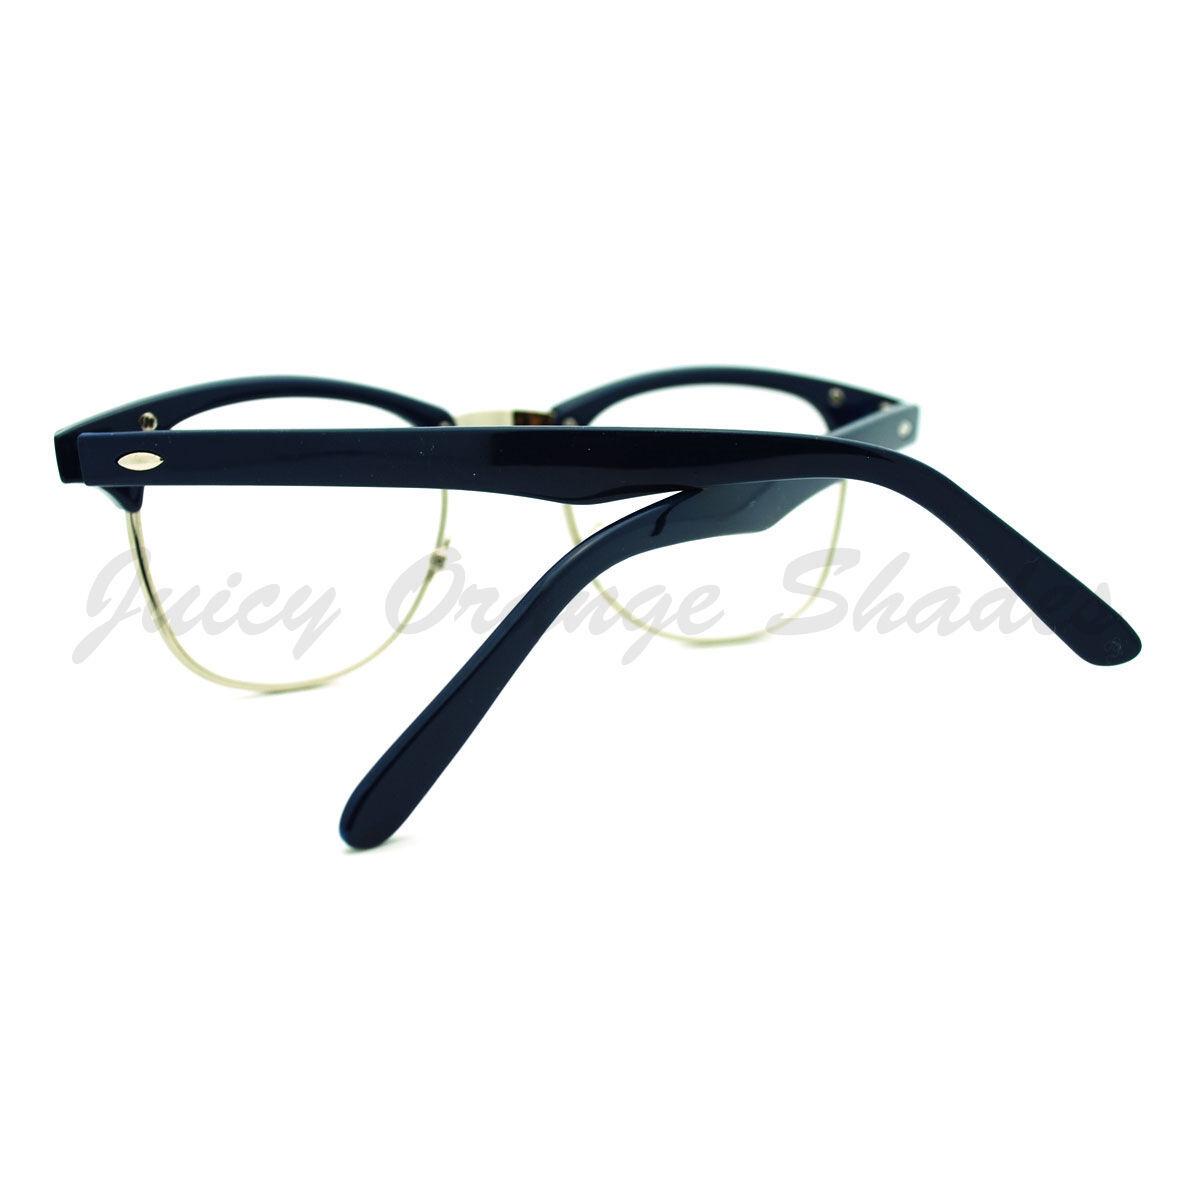 Truly Vintage Clear Lens Glasses Round Half Horn Rim Eyeglasses